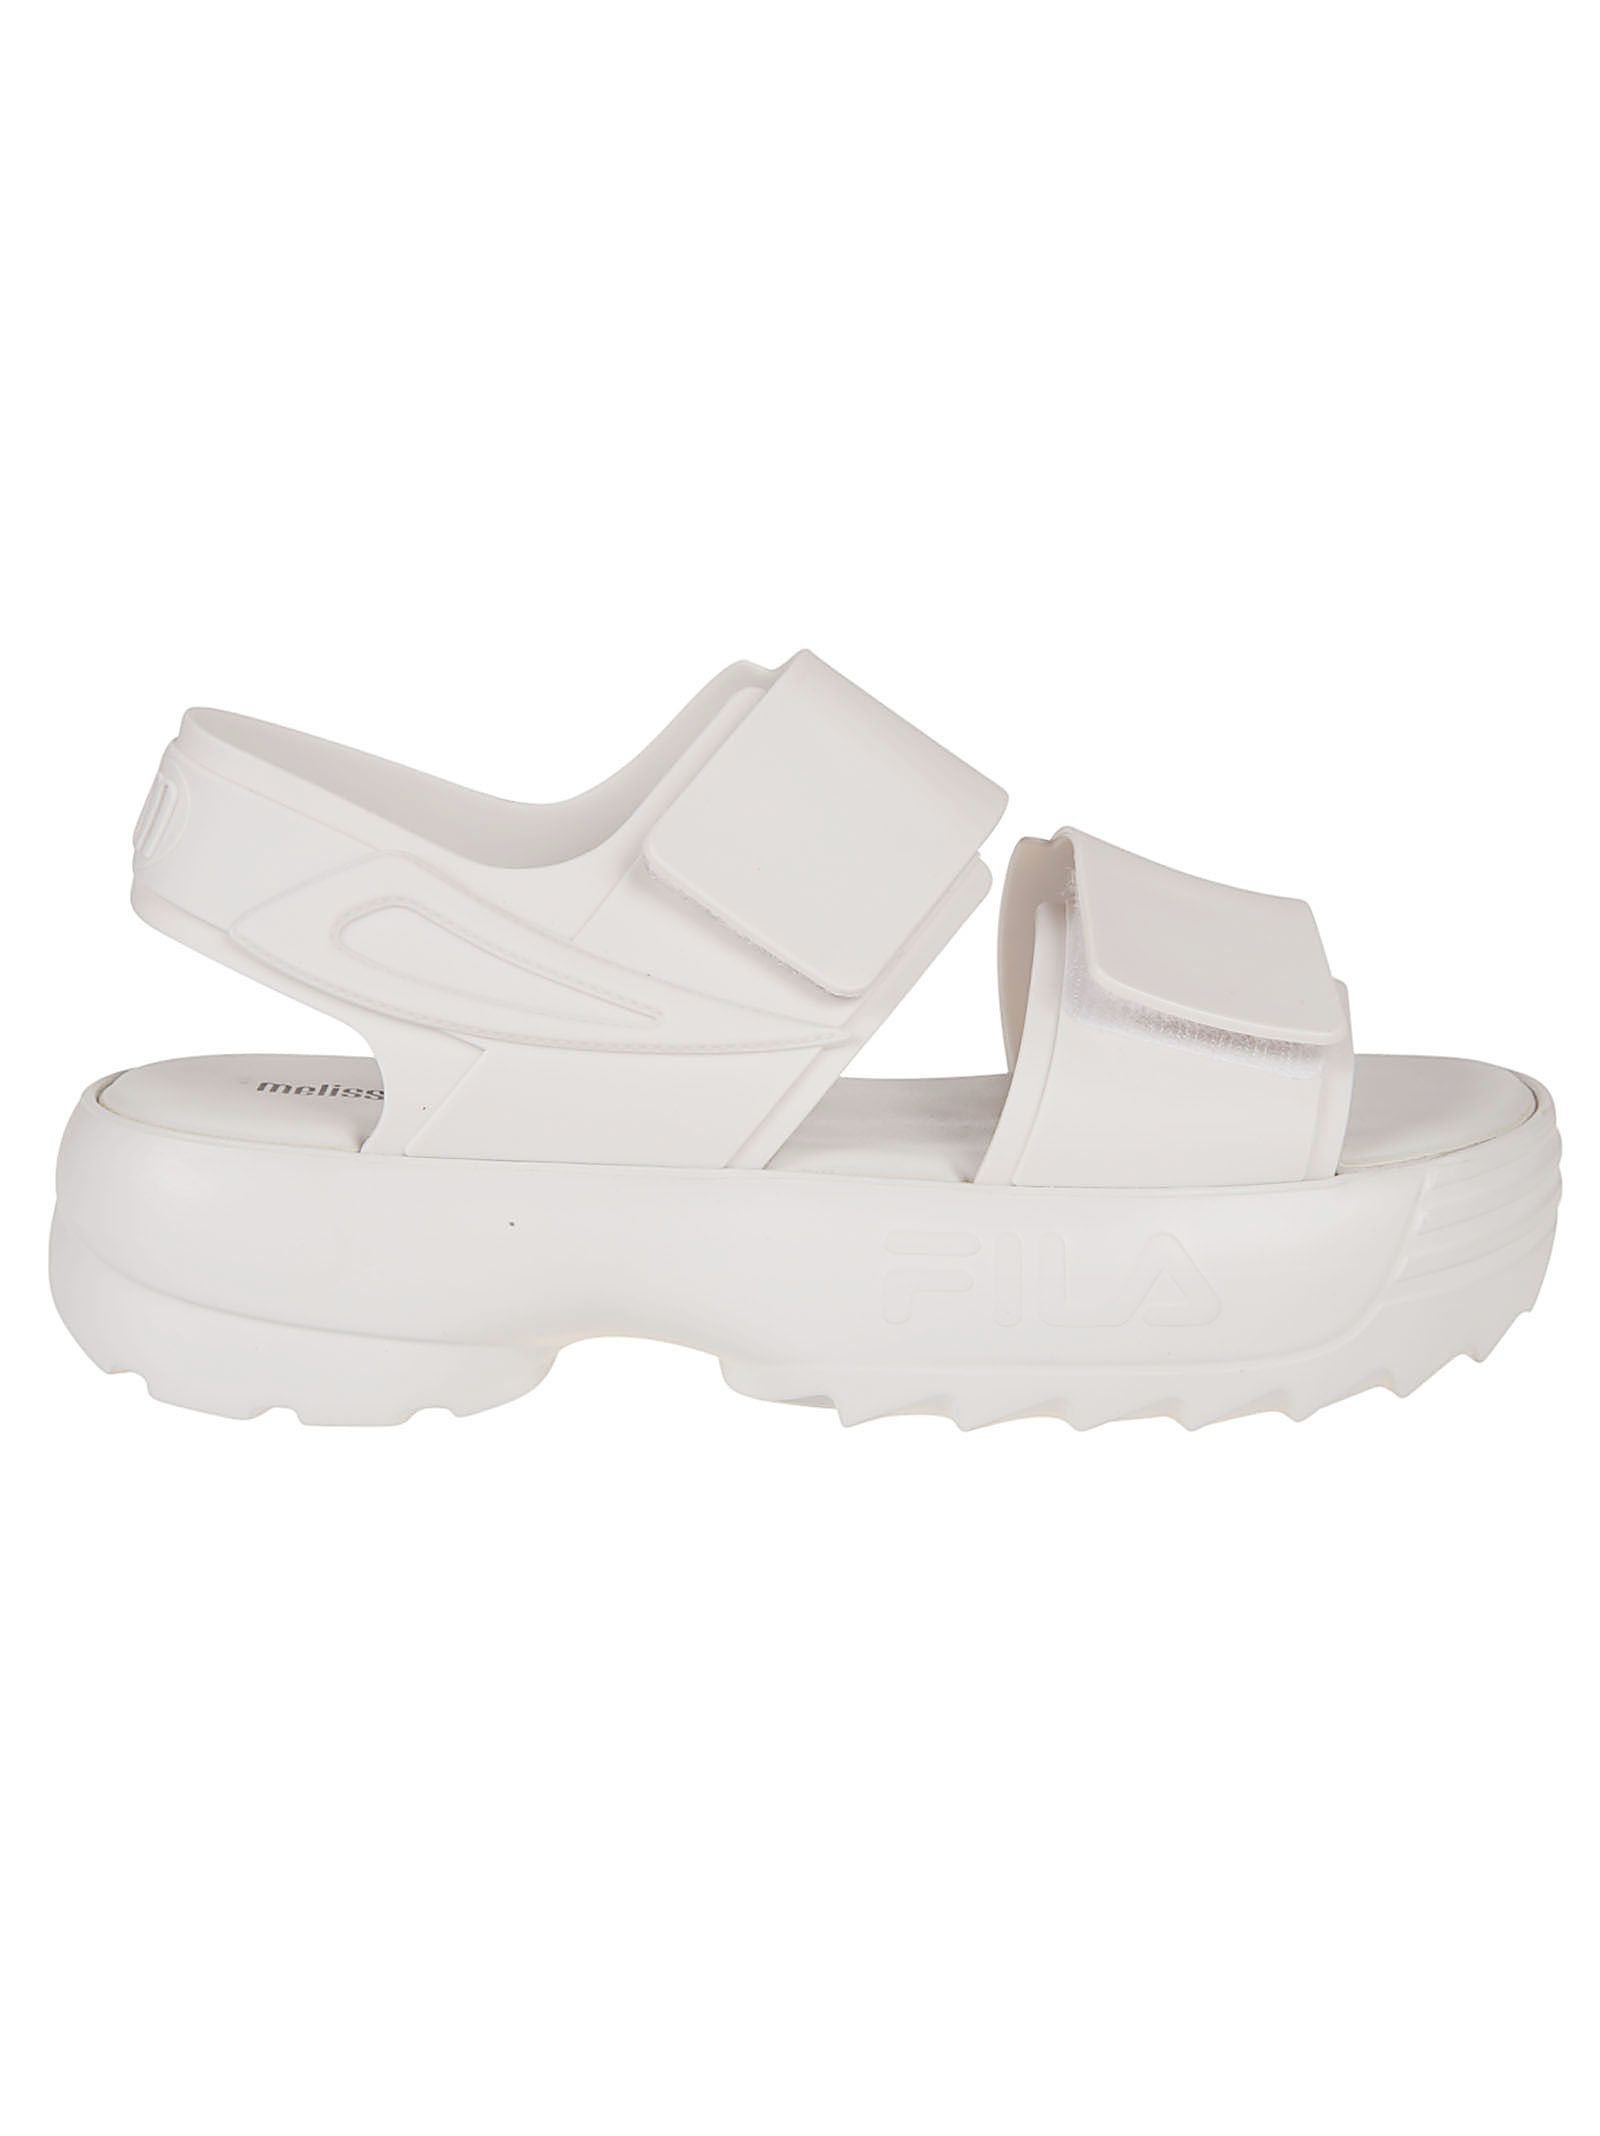 6ce2b23cee89 Melissa Melissa X Fila Classy Wedge Sandals - White - 10908832